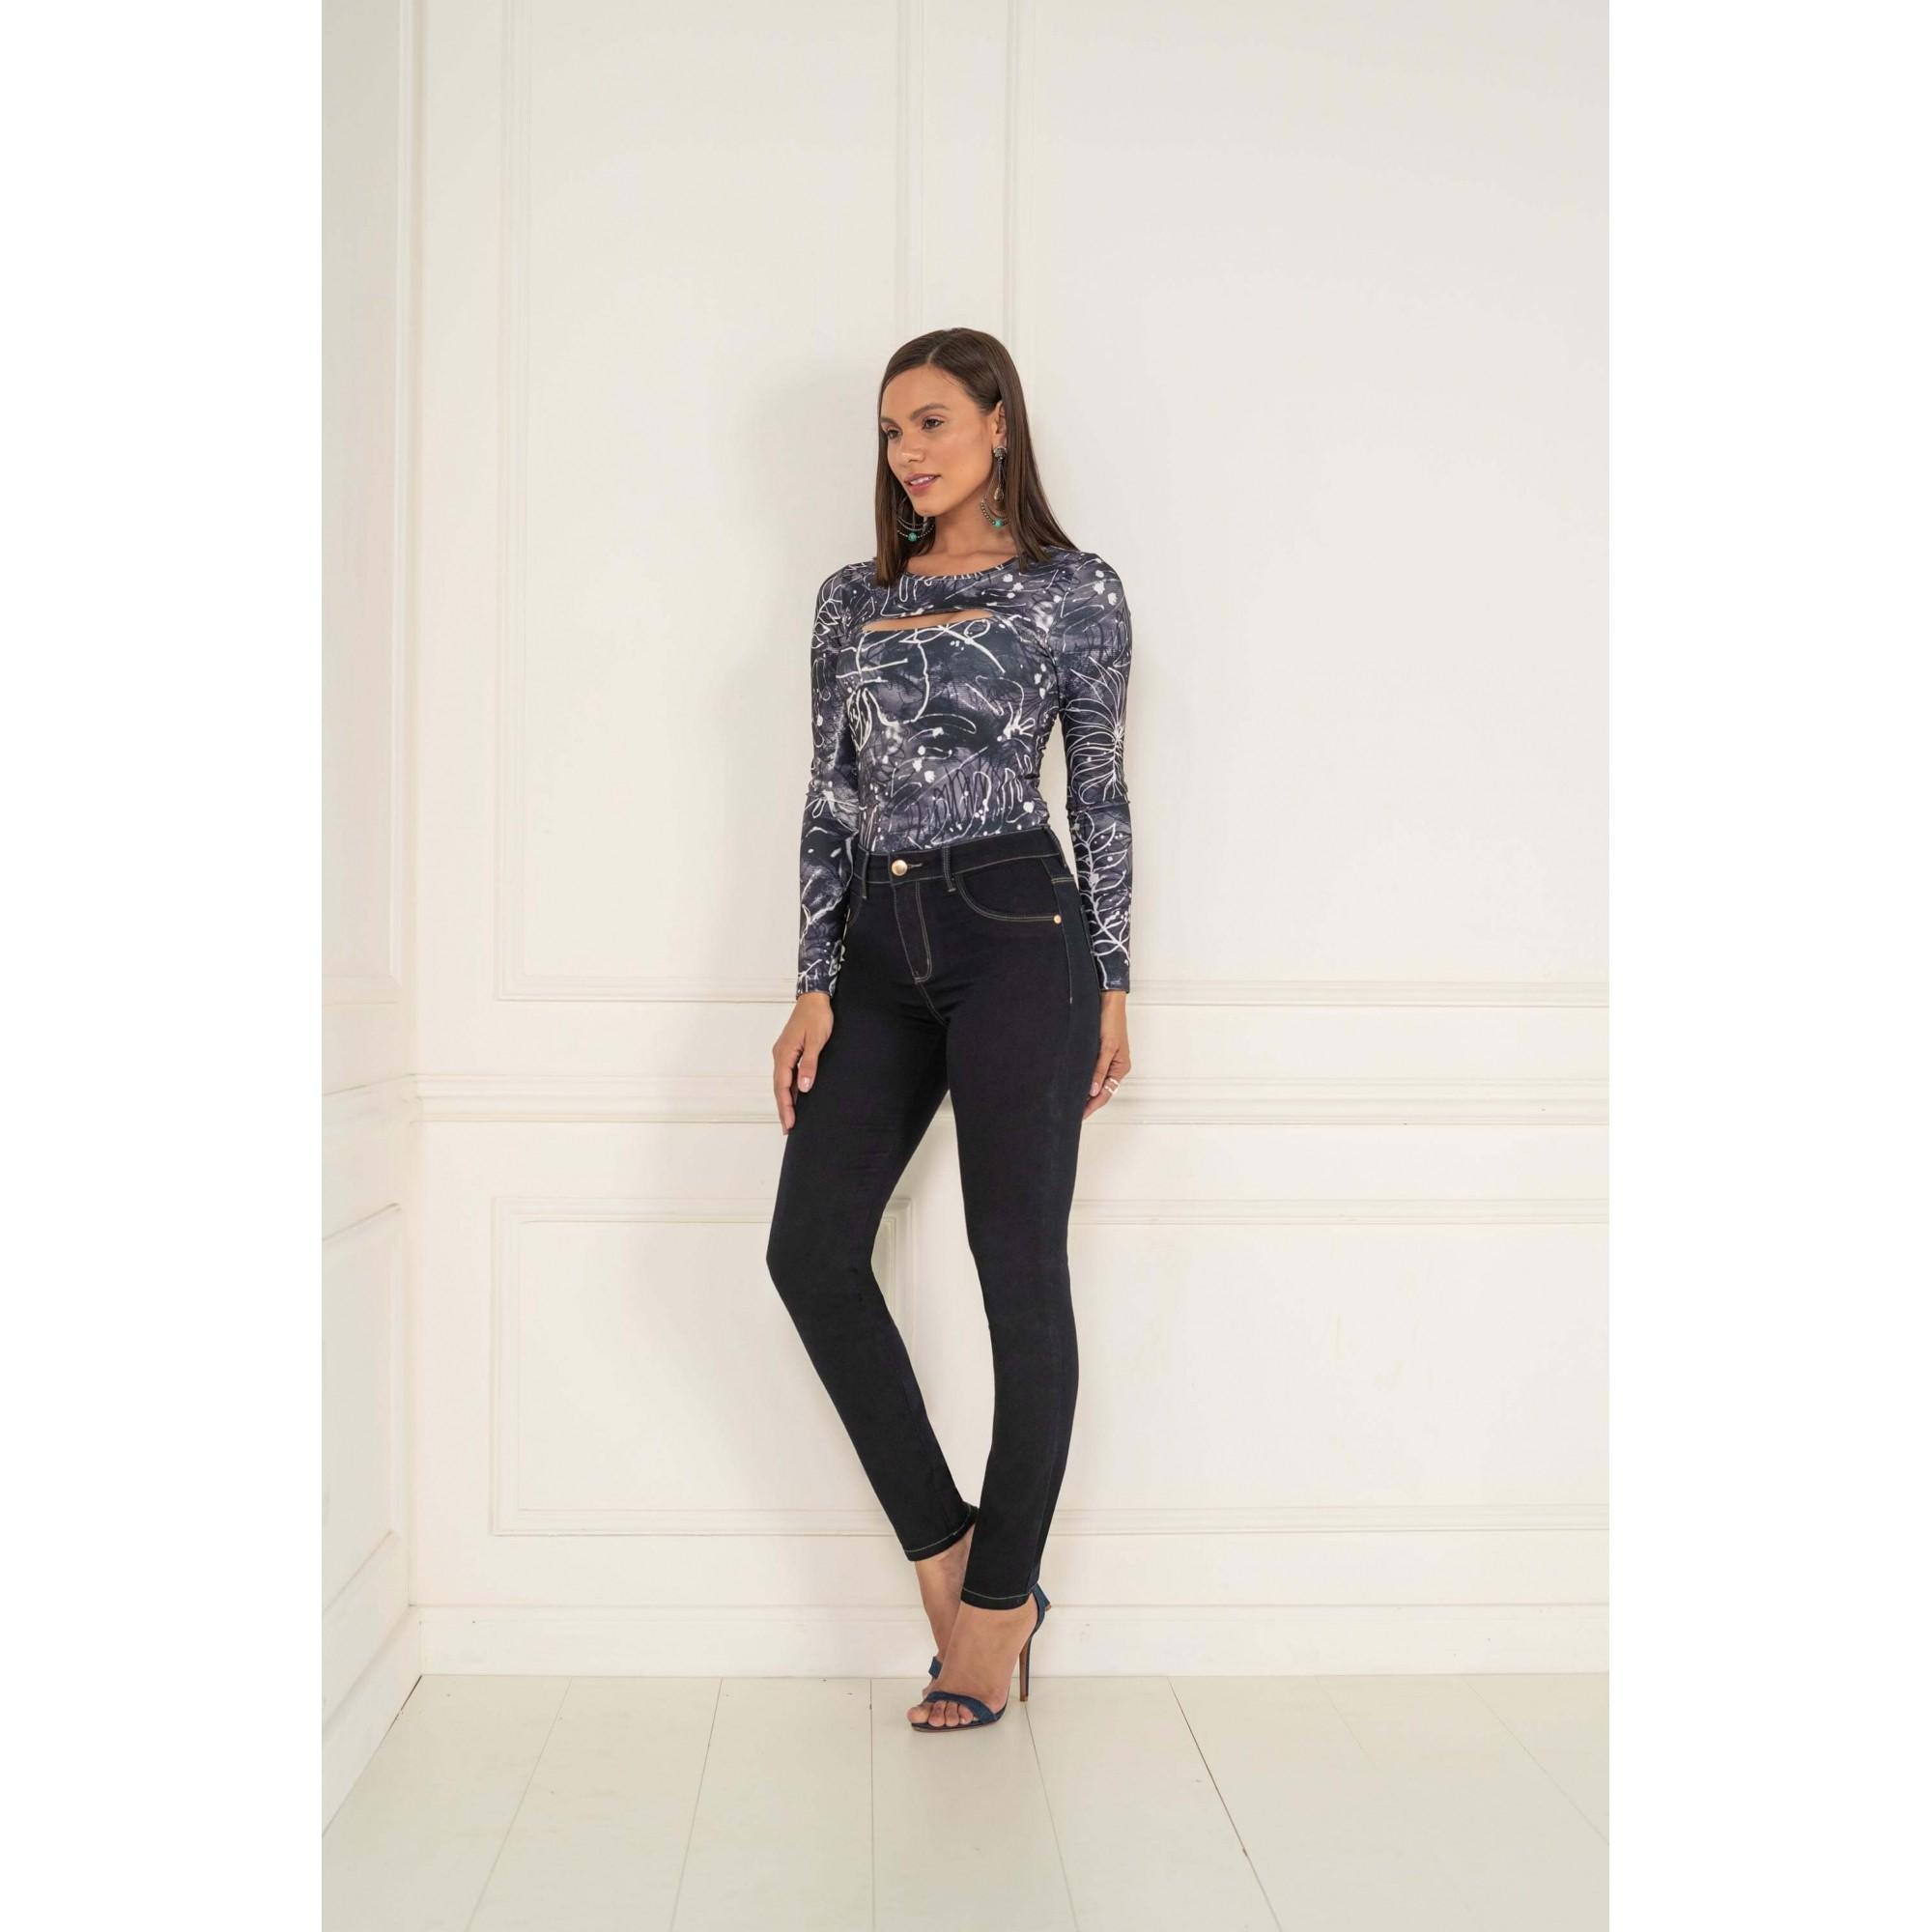 Calça Jegging Lycra Jeans Feminino K20151 - KACOLAKO